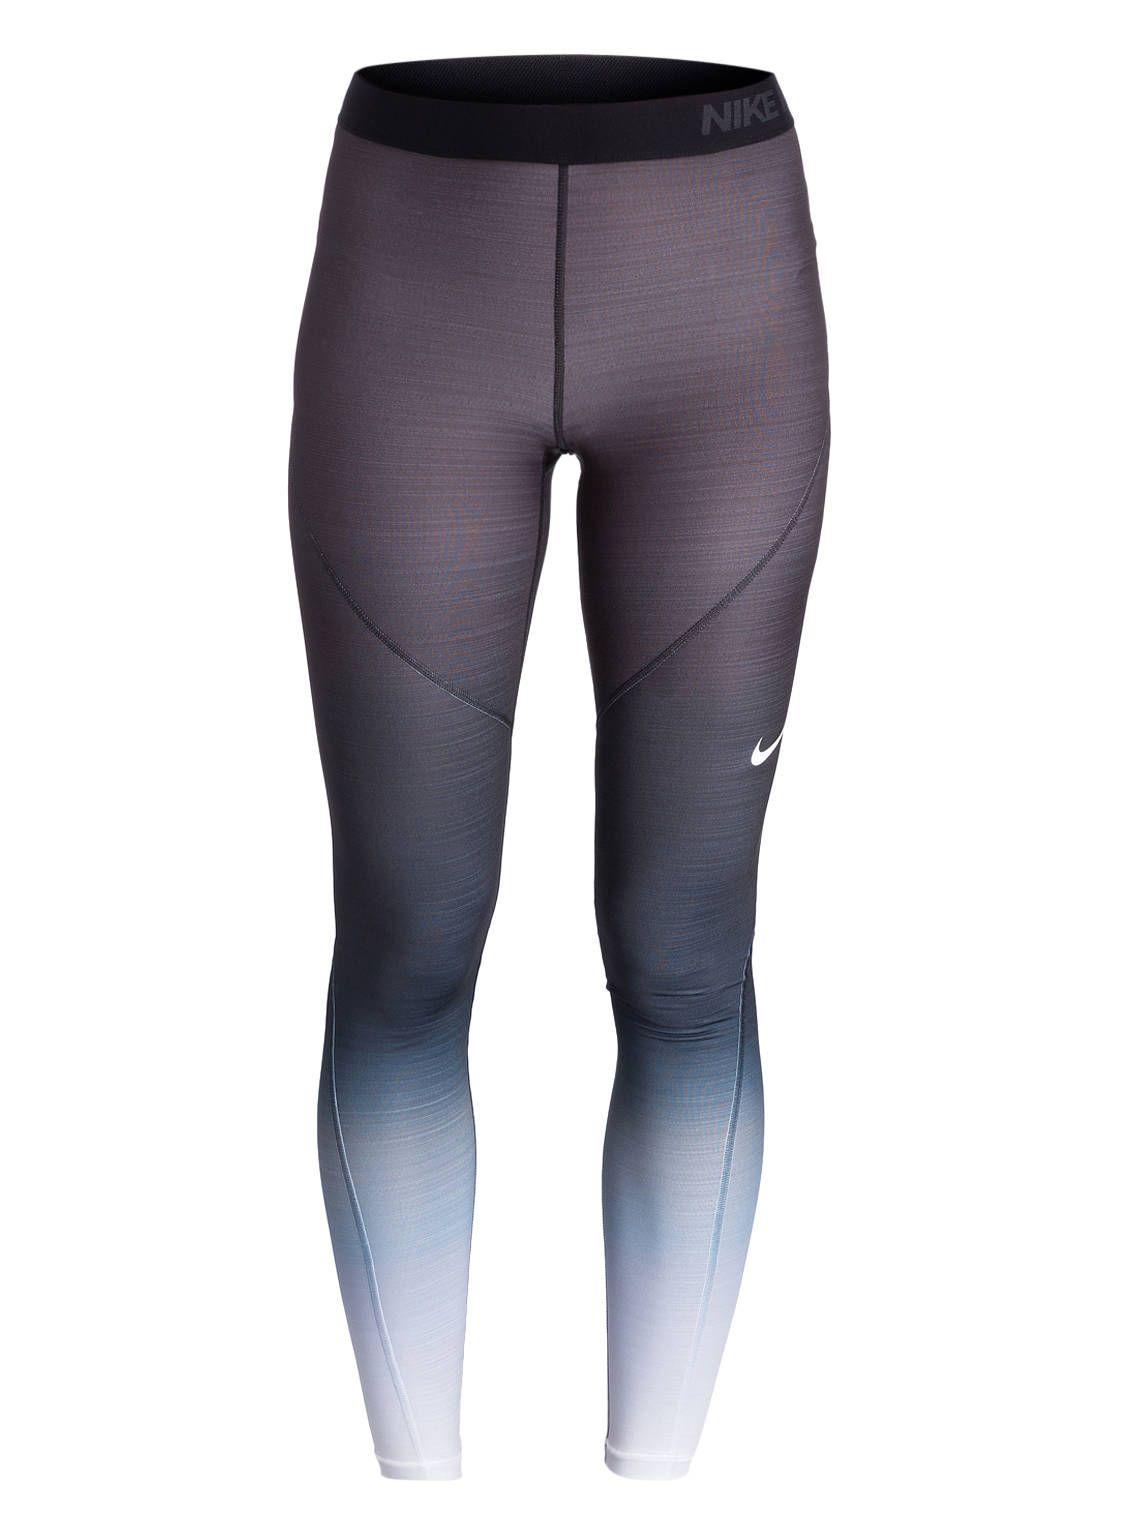 best loved aaa6a 3cf7c Nike tights pro hyperwarm schwarz sport damen fitness und training hosen   2yvUGAN7 553894  - €